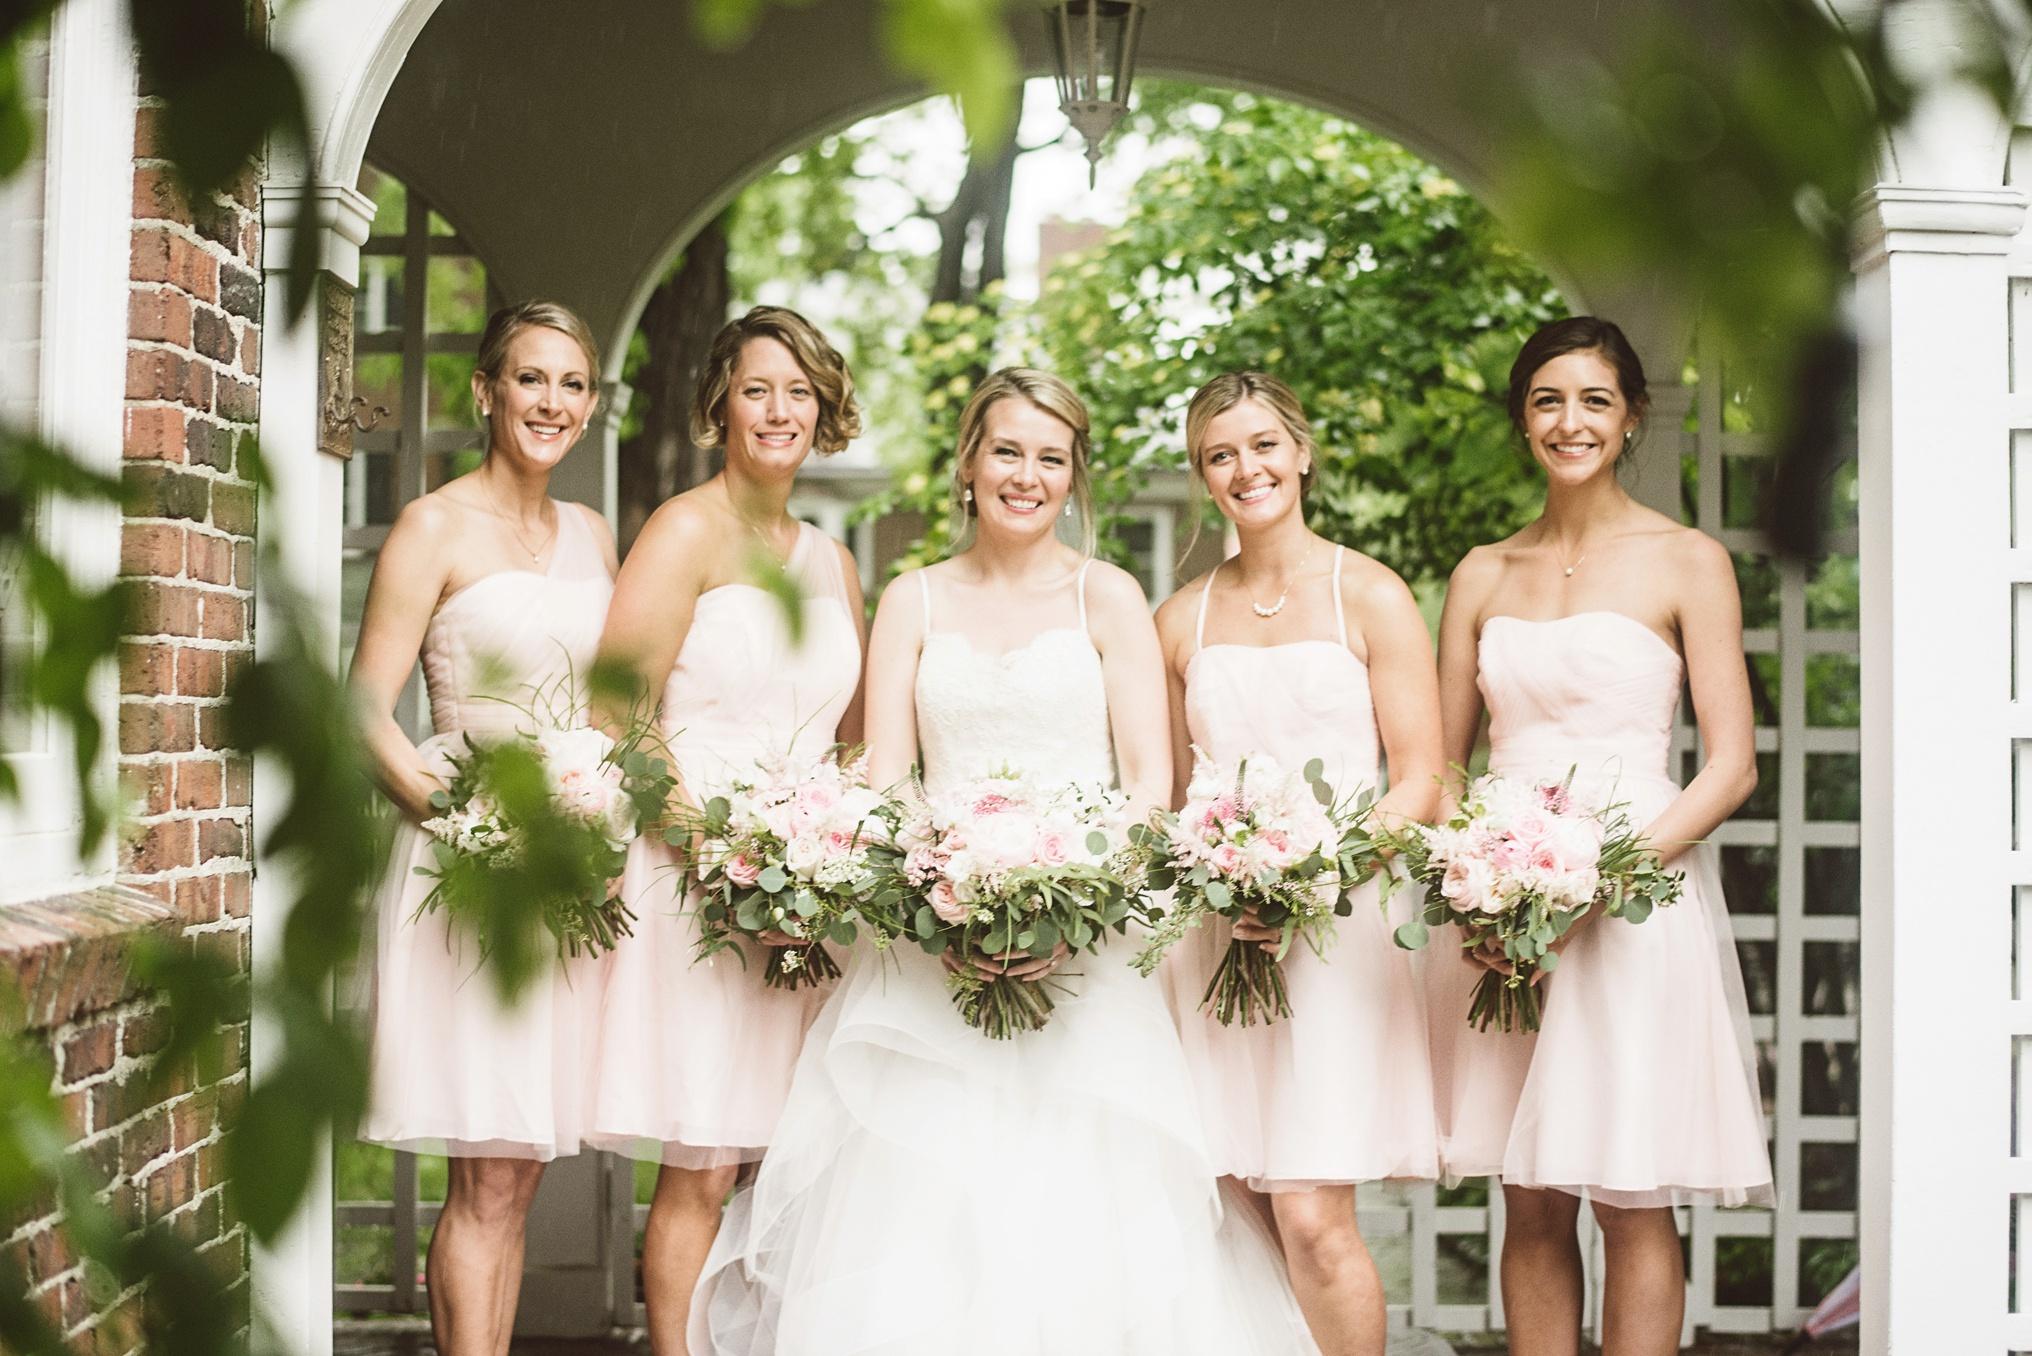 best_wedding_photography_2017_by_lucas_botz_photography_087.jpg